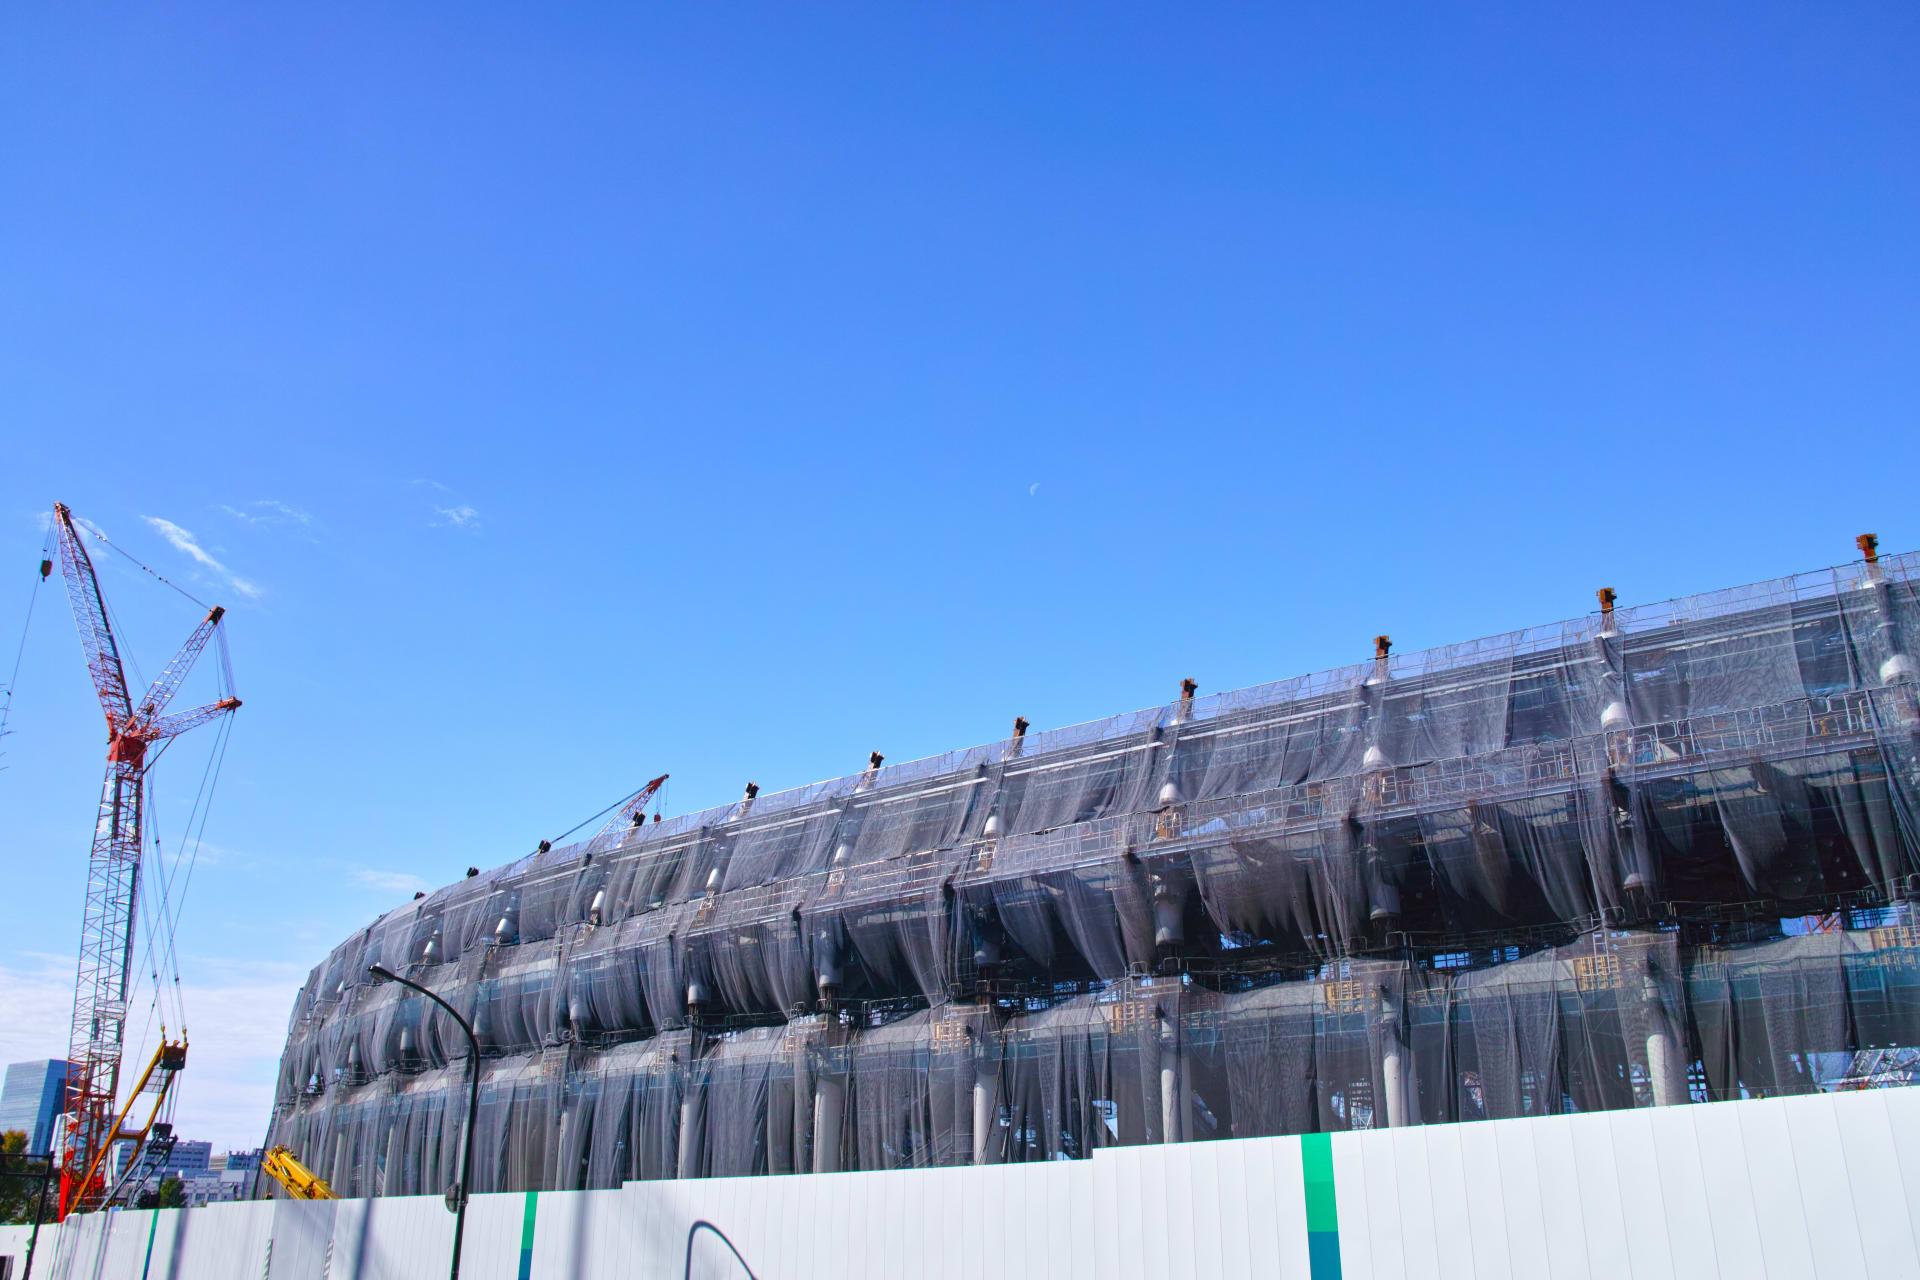 Tokyo - Japan National Stadium - Ready for the Olympics